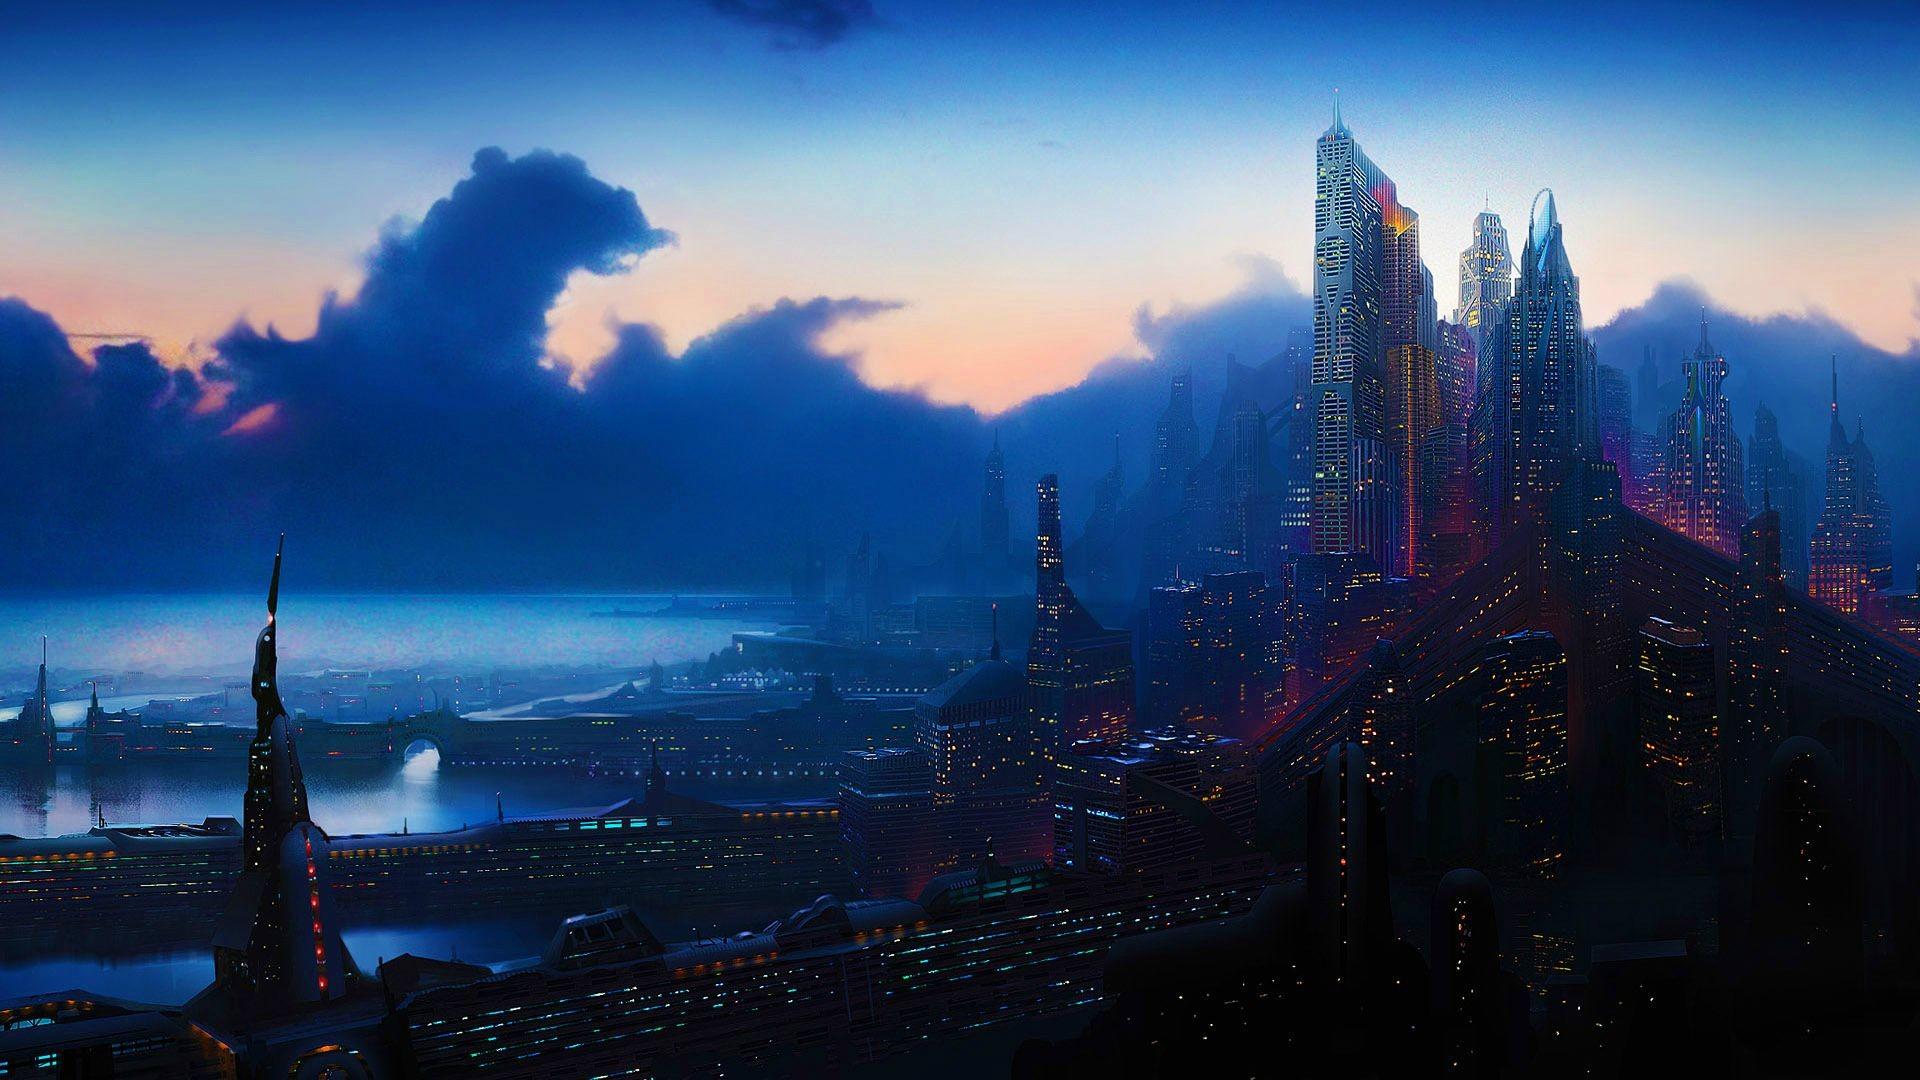 cyberpunk sci fi science fiction futuristic world cities architecture  buildings skyscrapers night lights window detail tech marina harbor oc.